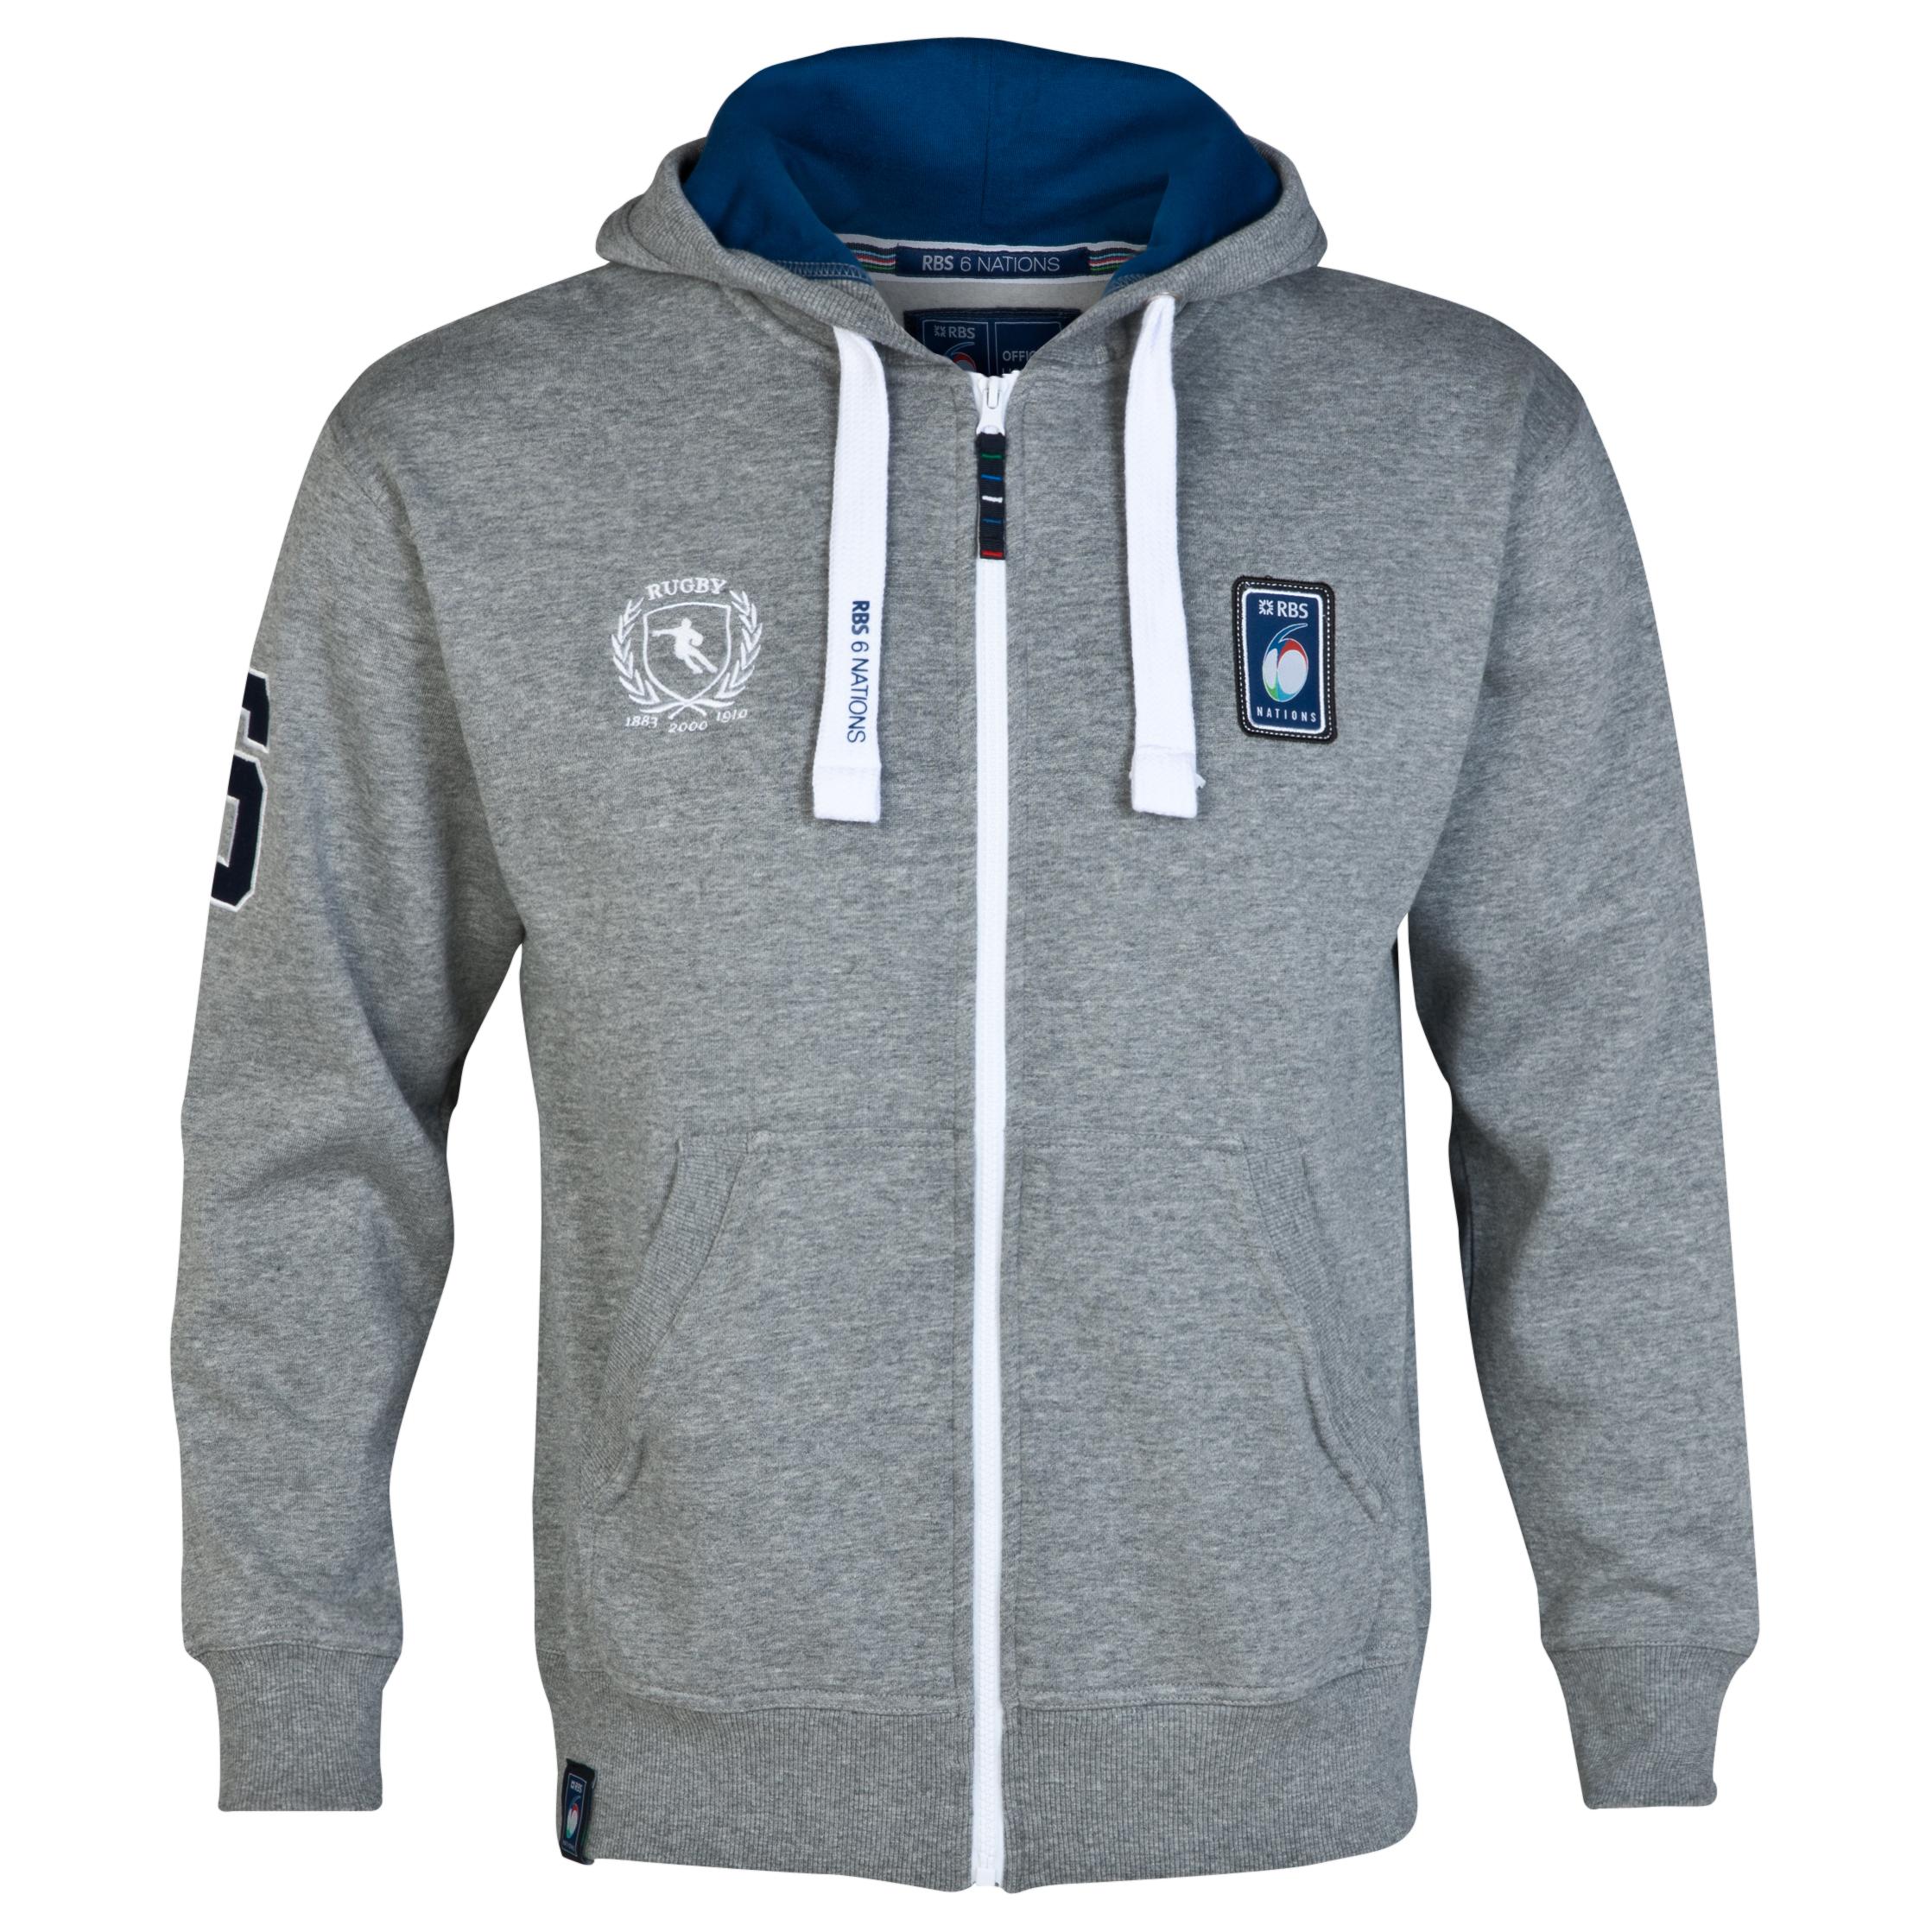 RBS Six Nations Classic Full Zip Hoody - Mens - Grey